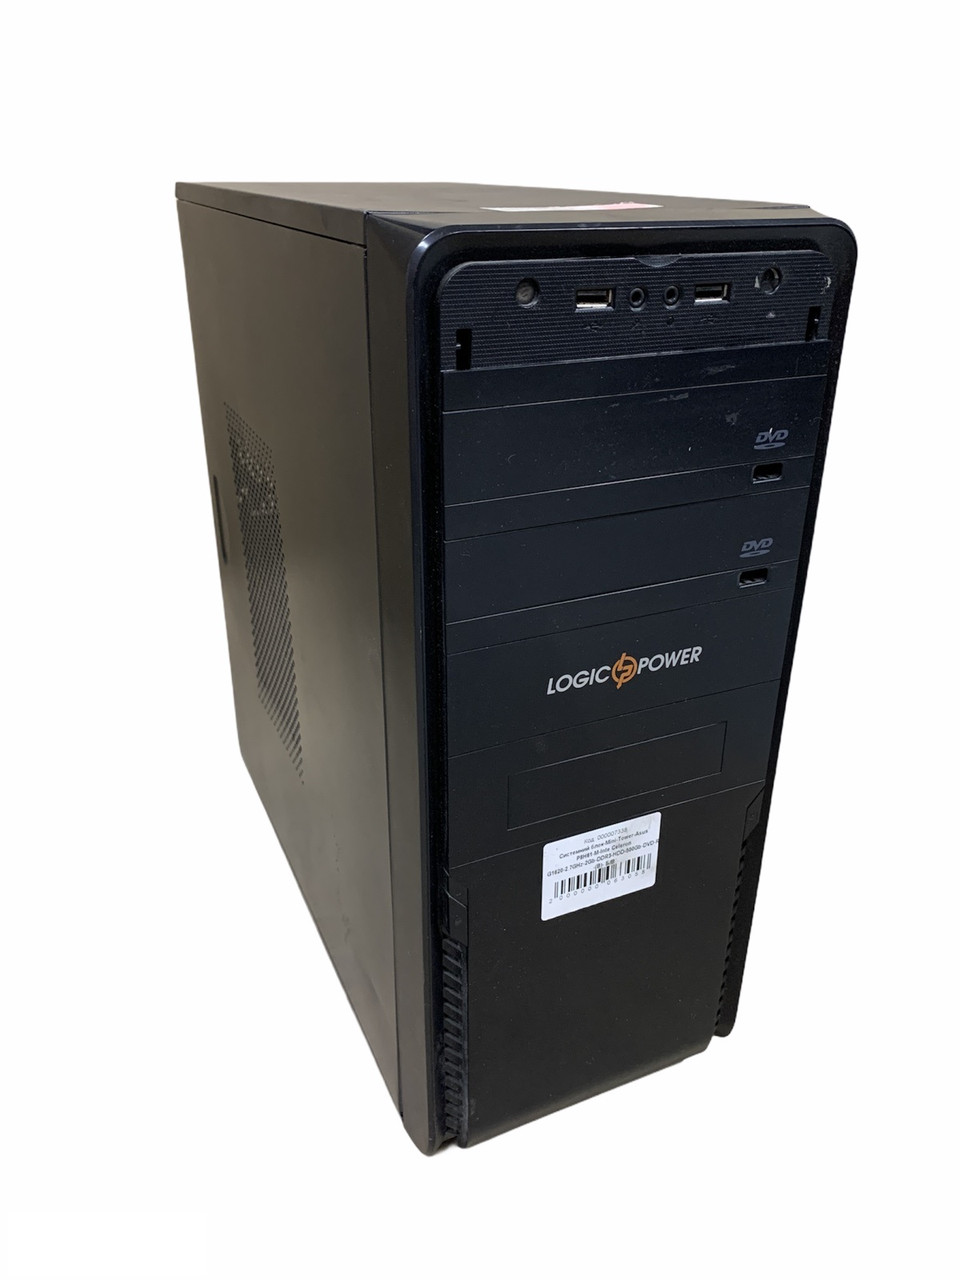 Системный блок-Mini-Tower-Asus P8H61-M-Inte Celeron G1620-2.7GHz-2Gb-DDR3-HDD-500Gb-(B)- Б/У